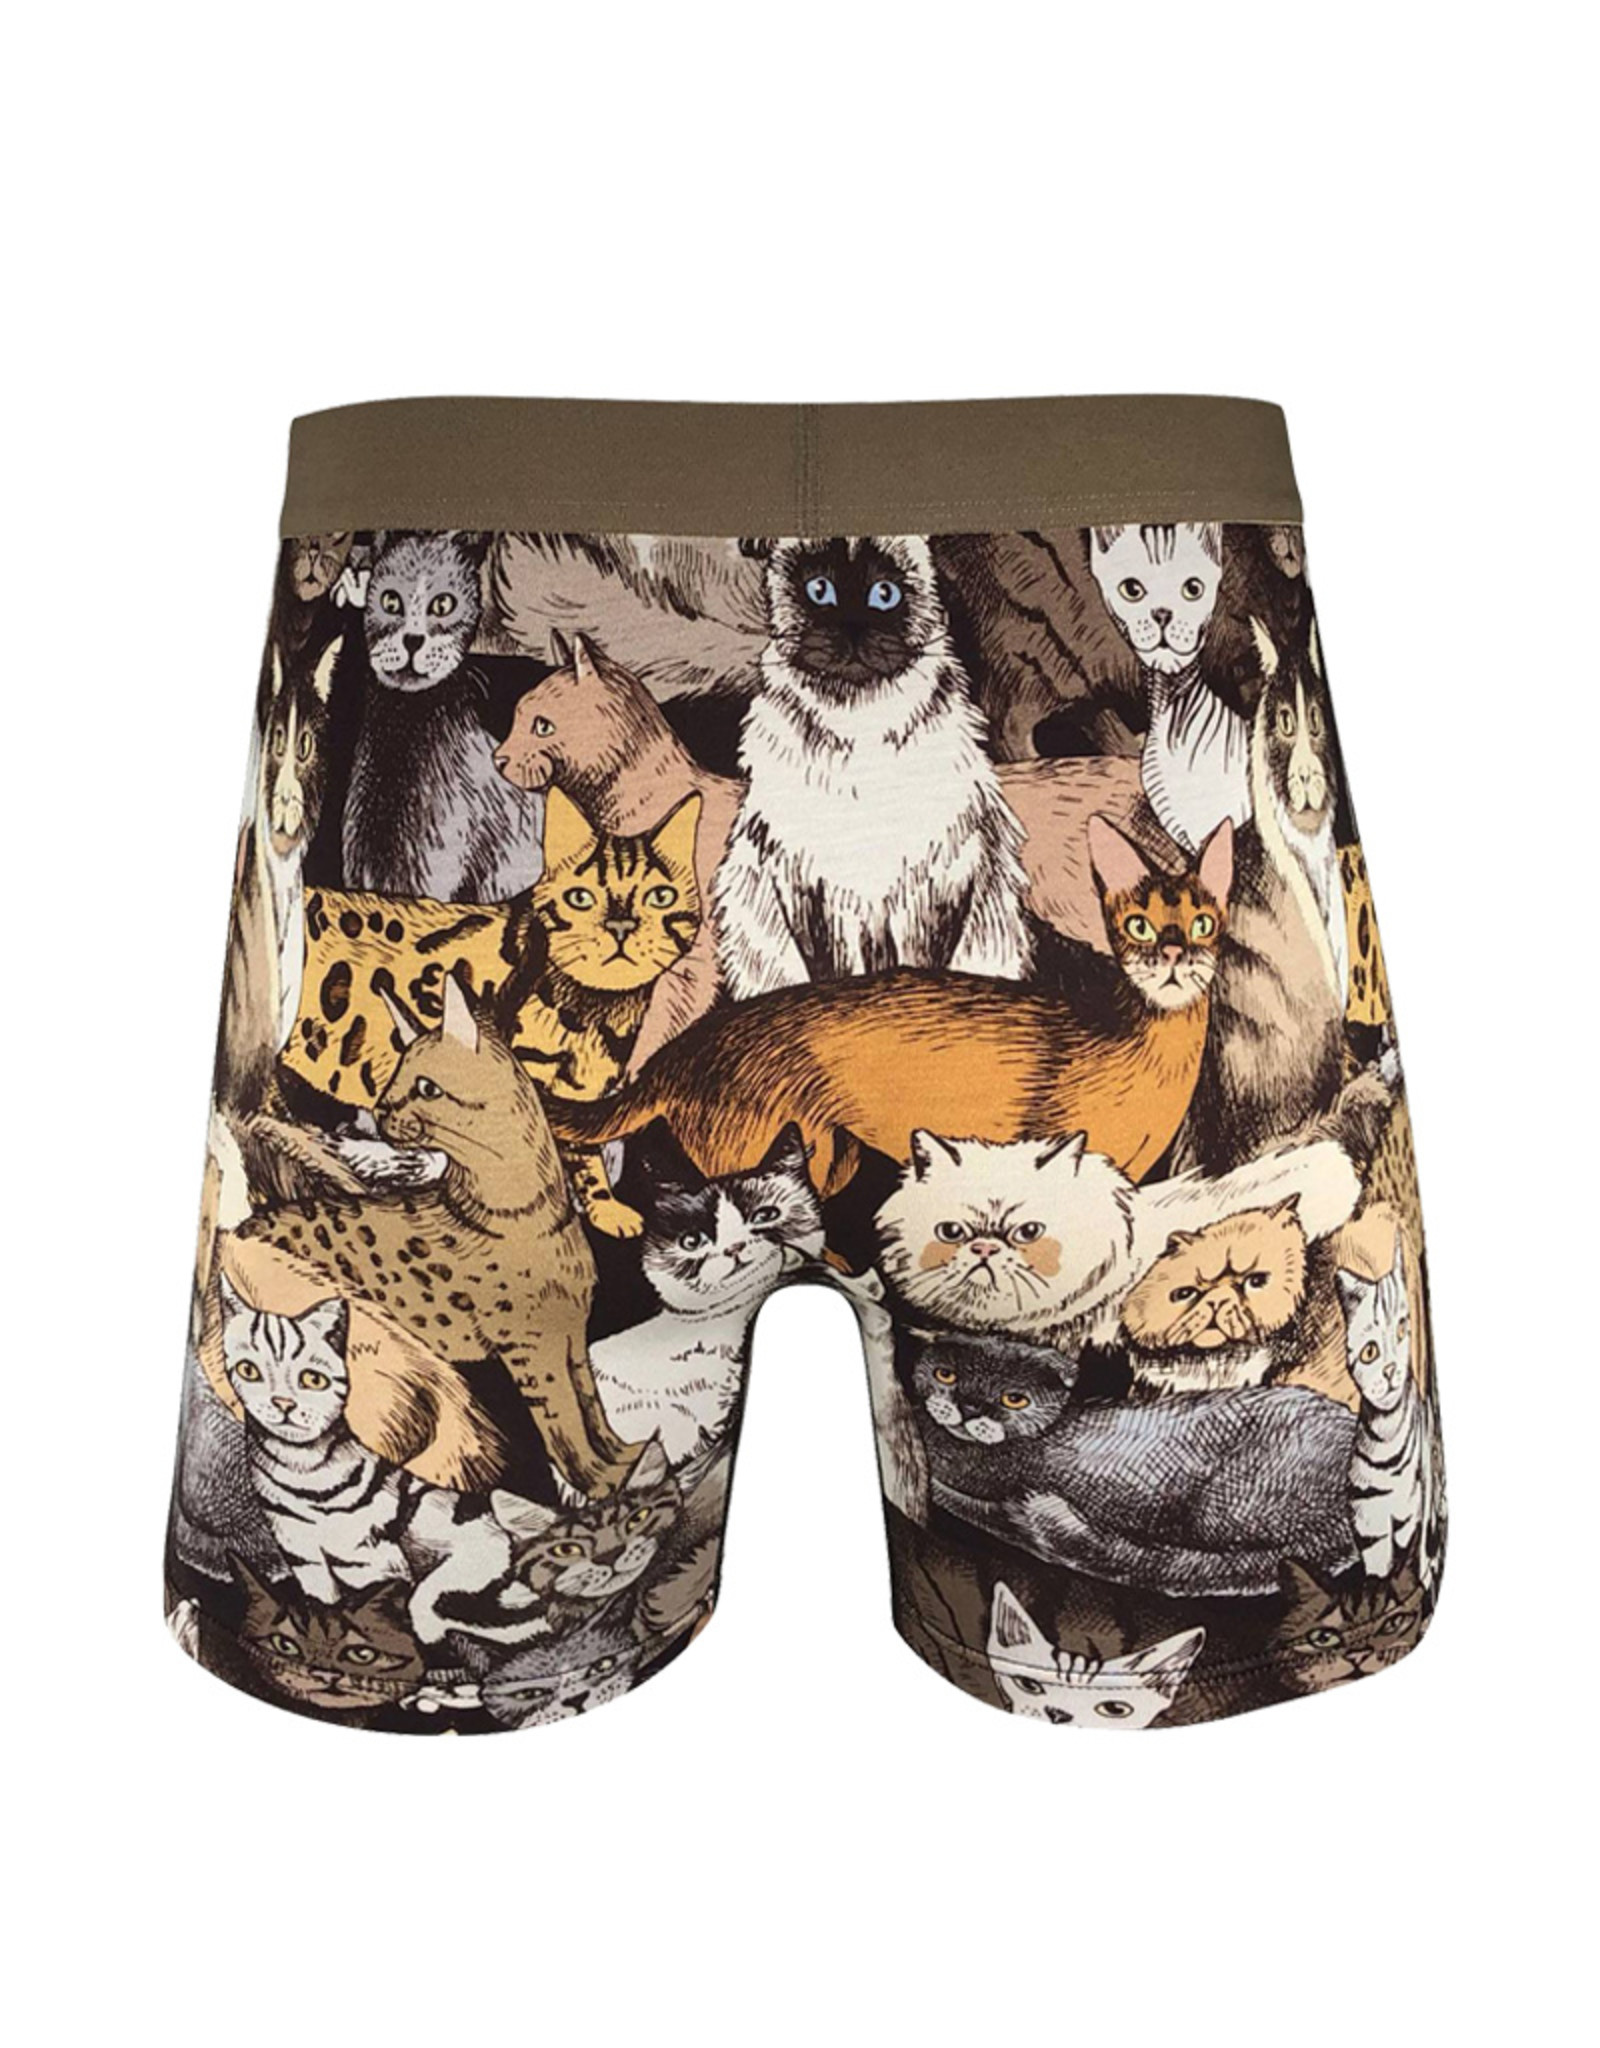 Boxer ( Good Luck Undies ) Cats